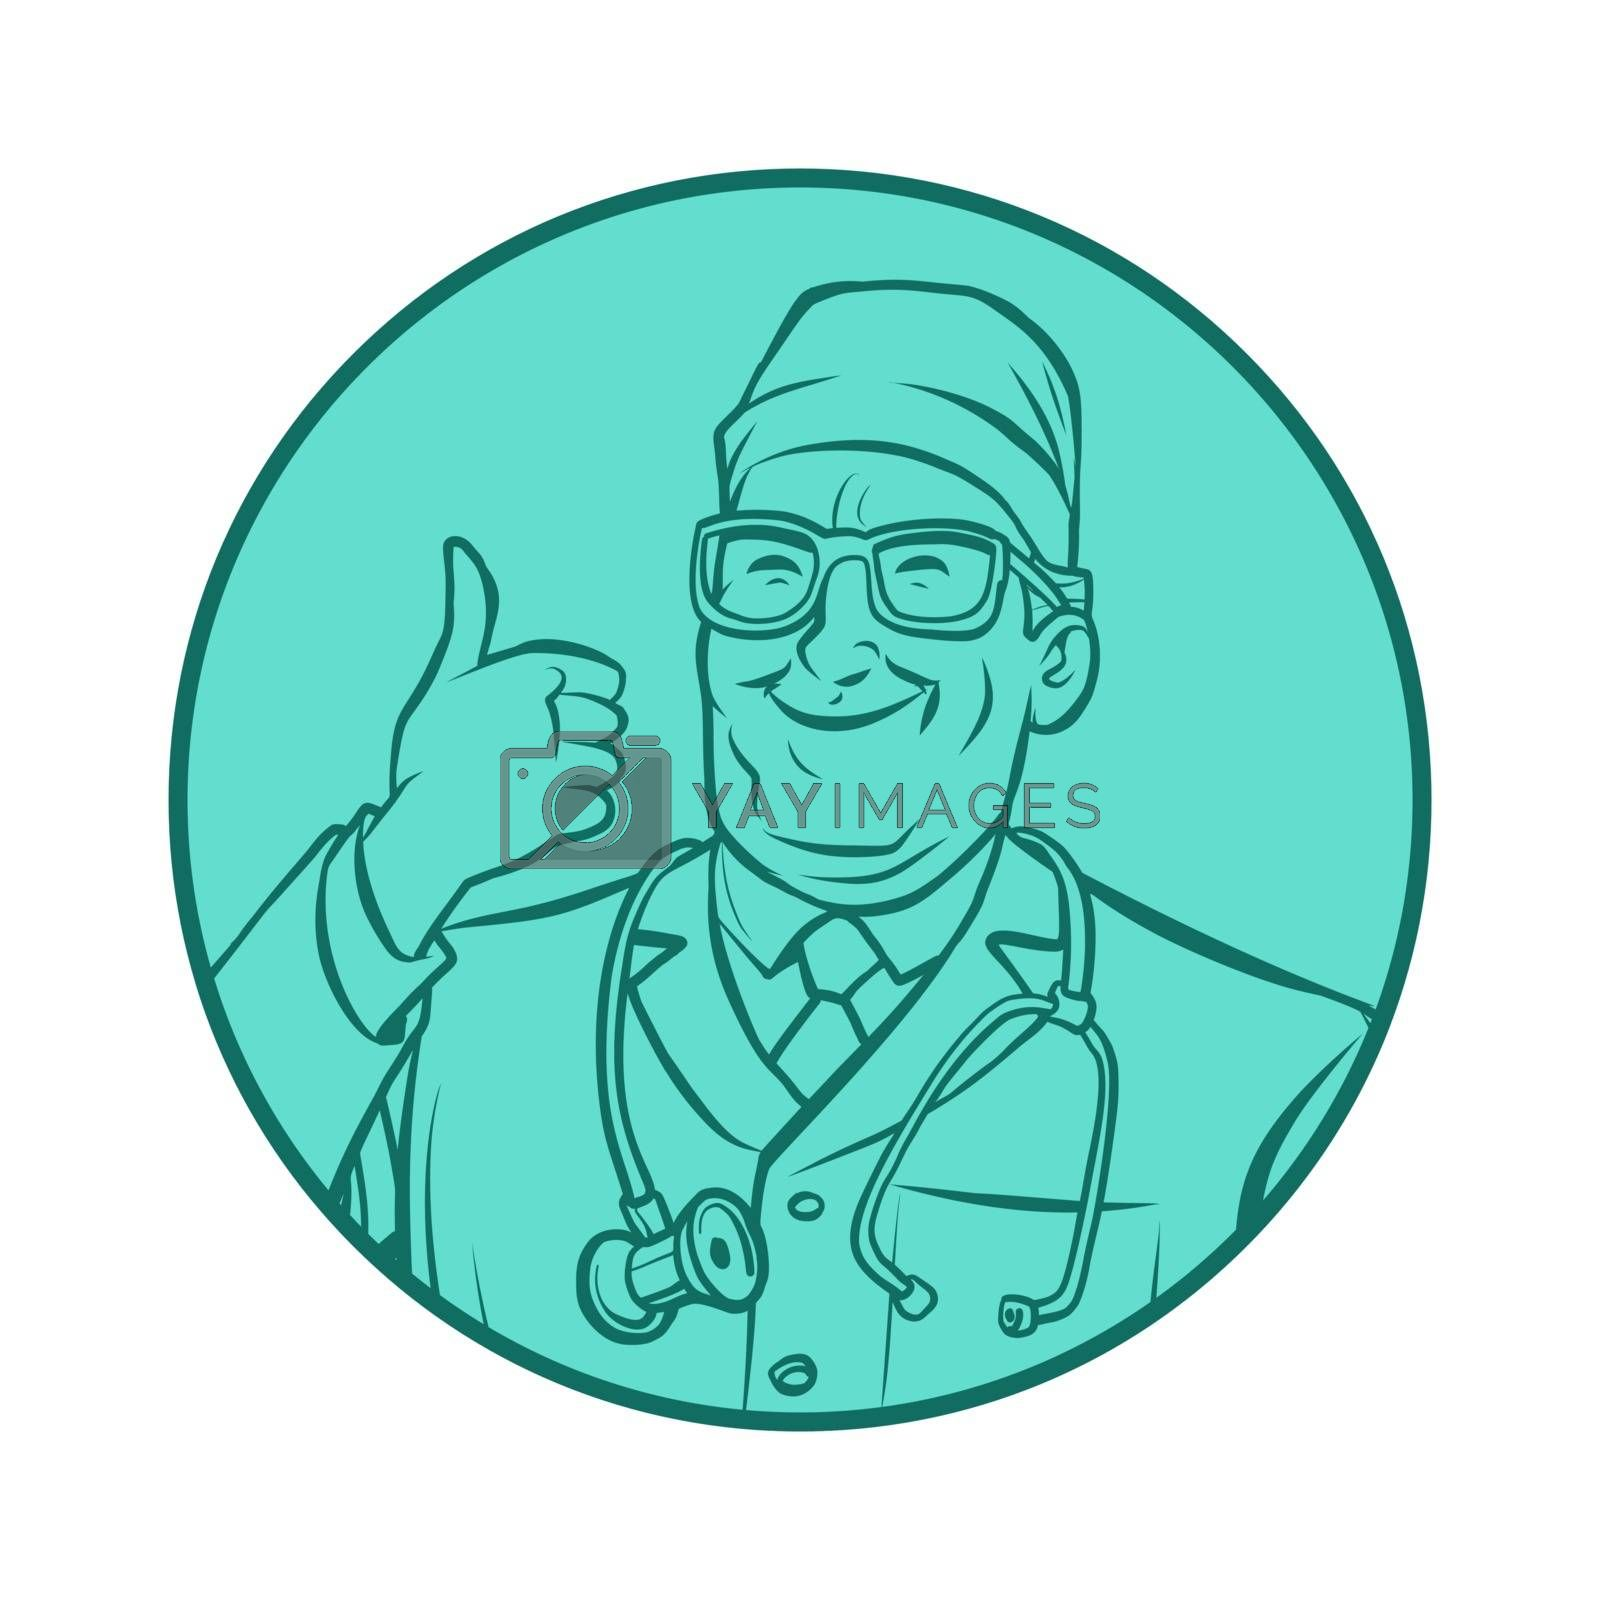 leinart graphics doctor therapist, thumb up gesture. Comic cartoon pop art retro vector drawing illustration